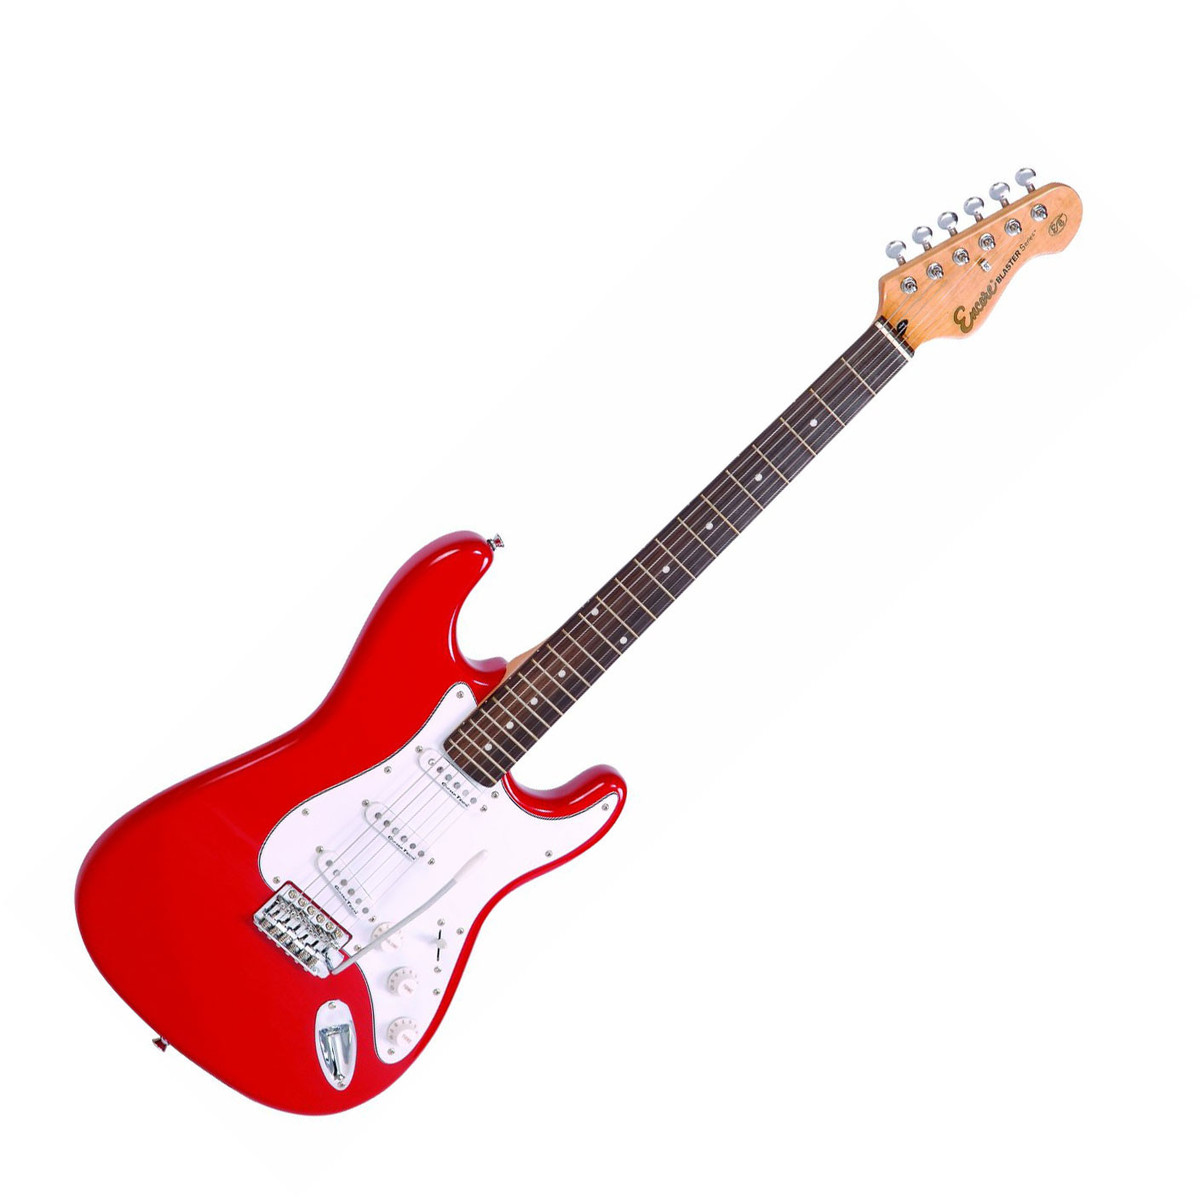 Red Electric Guitar : encore e6 electric guitar red at gear4music ~ Vivirlamusica.com Haus und Dekorationen